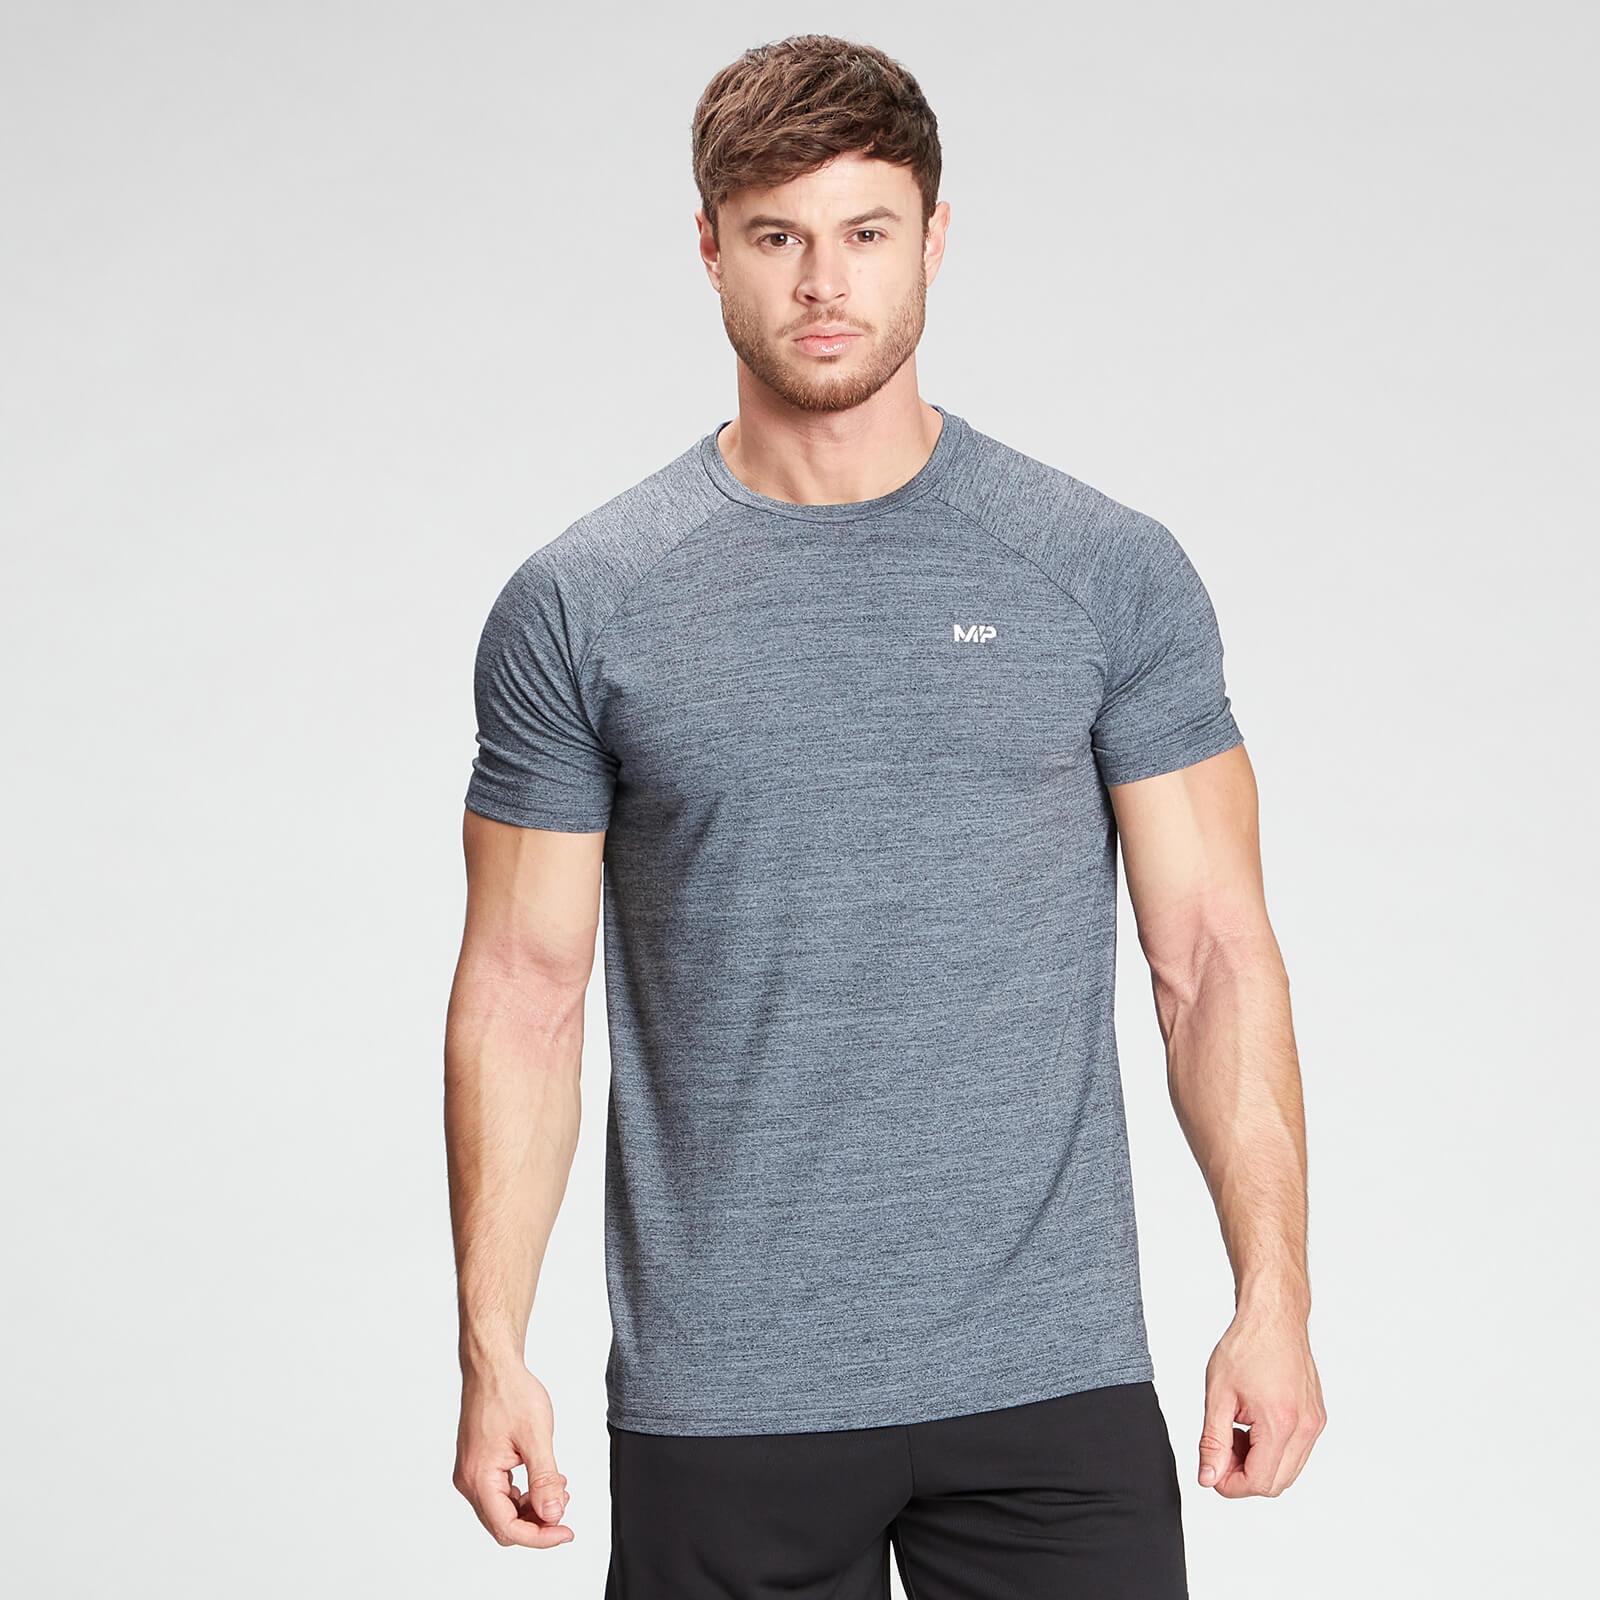 MP Men's Performance Short Sleeve T-Shirt - Galaxy Marl - XXL